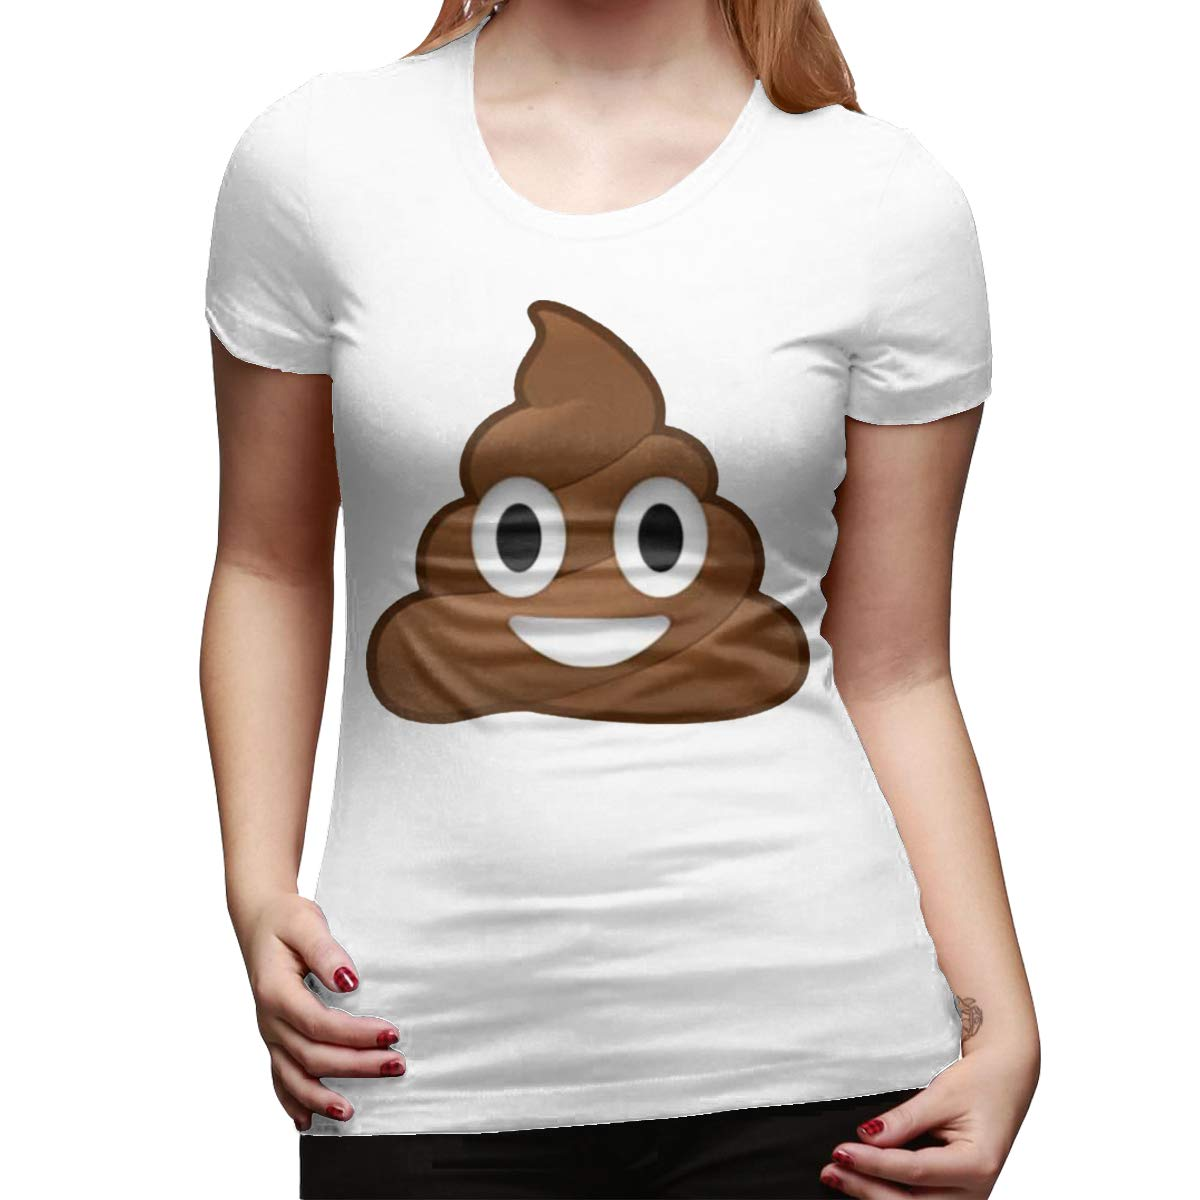 Kemeicle Womens Emoji Poop Shit Print Short Sleeves T Shirt